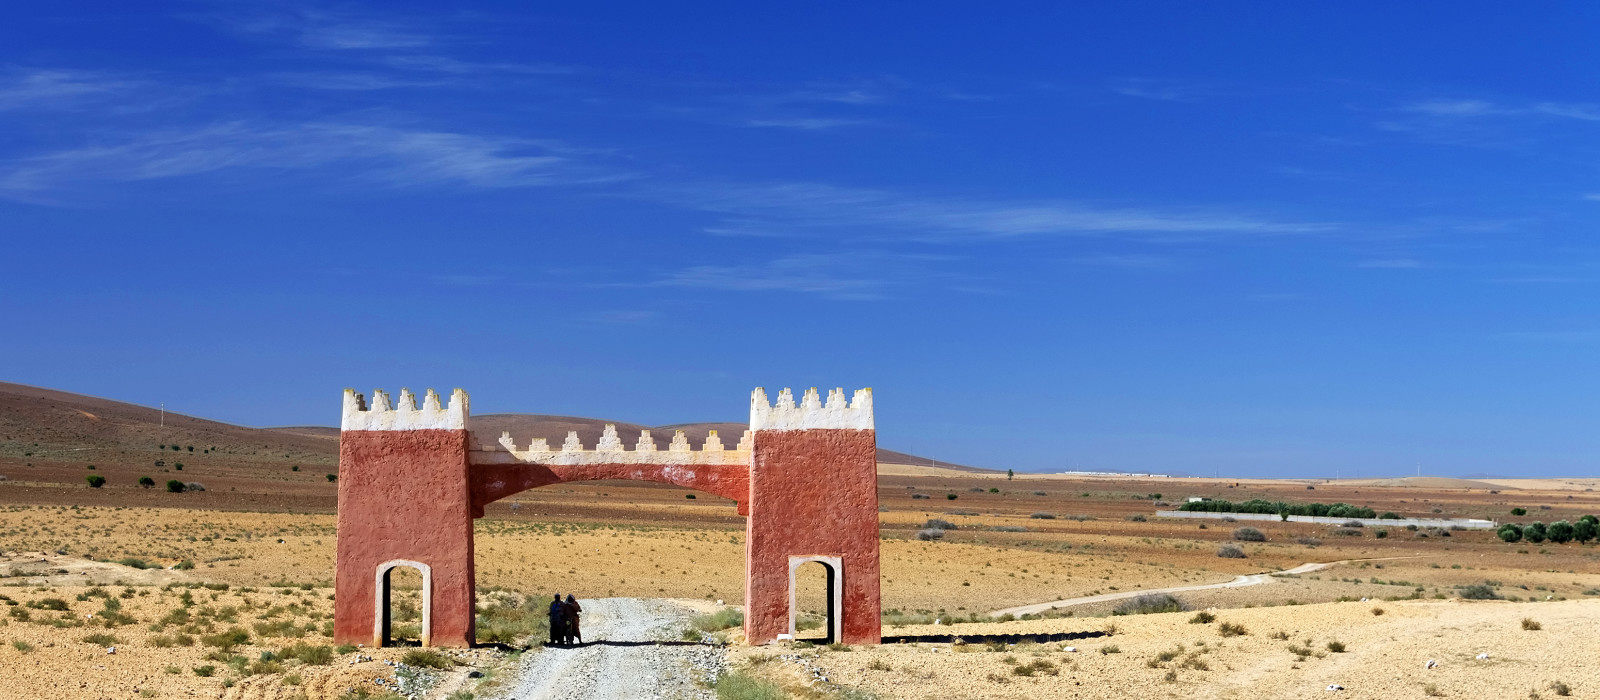 Destination Tafraoute Morocco